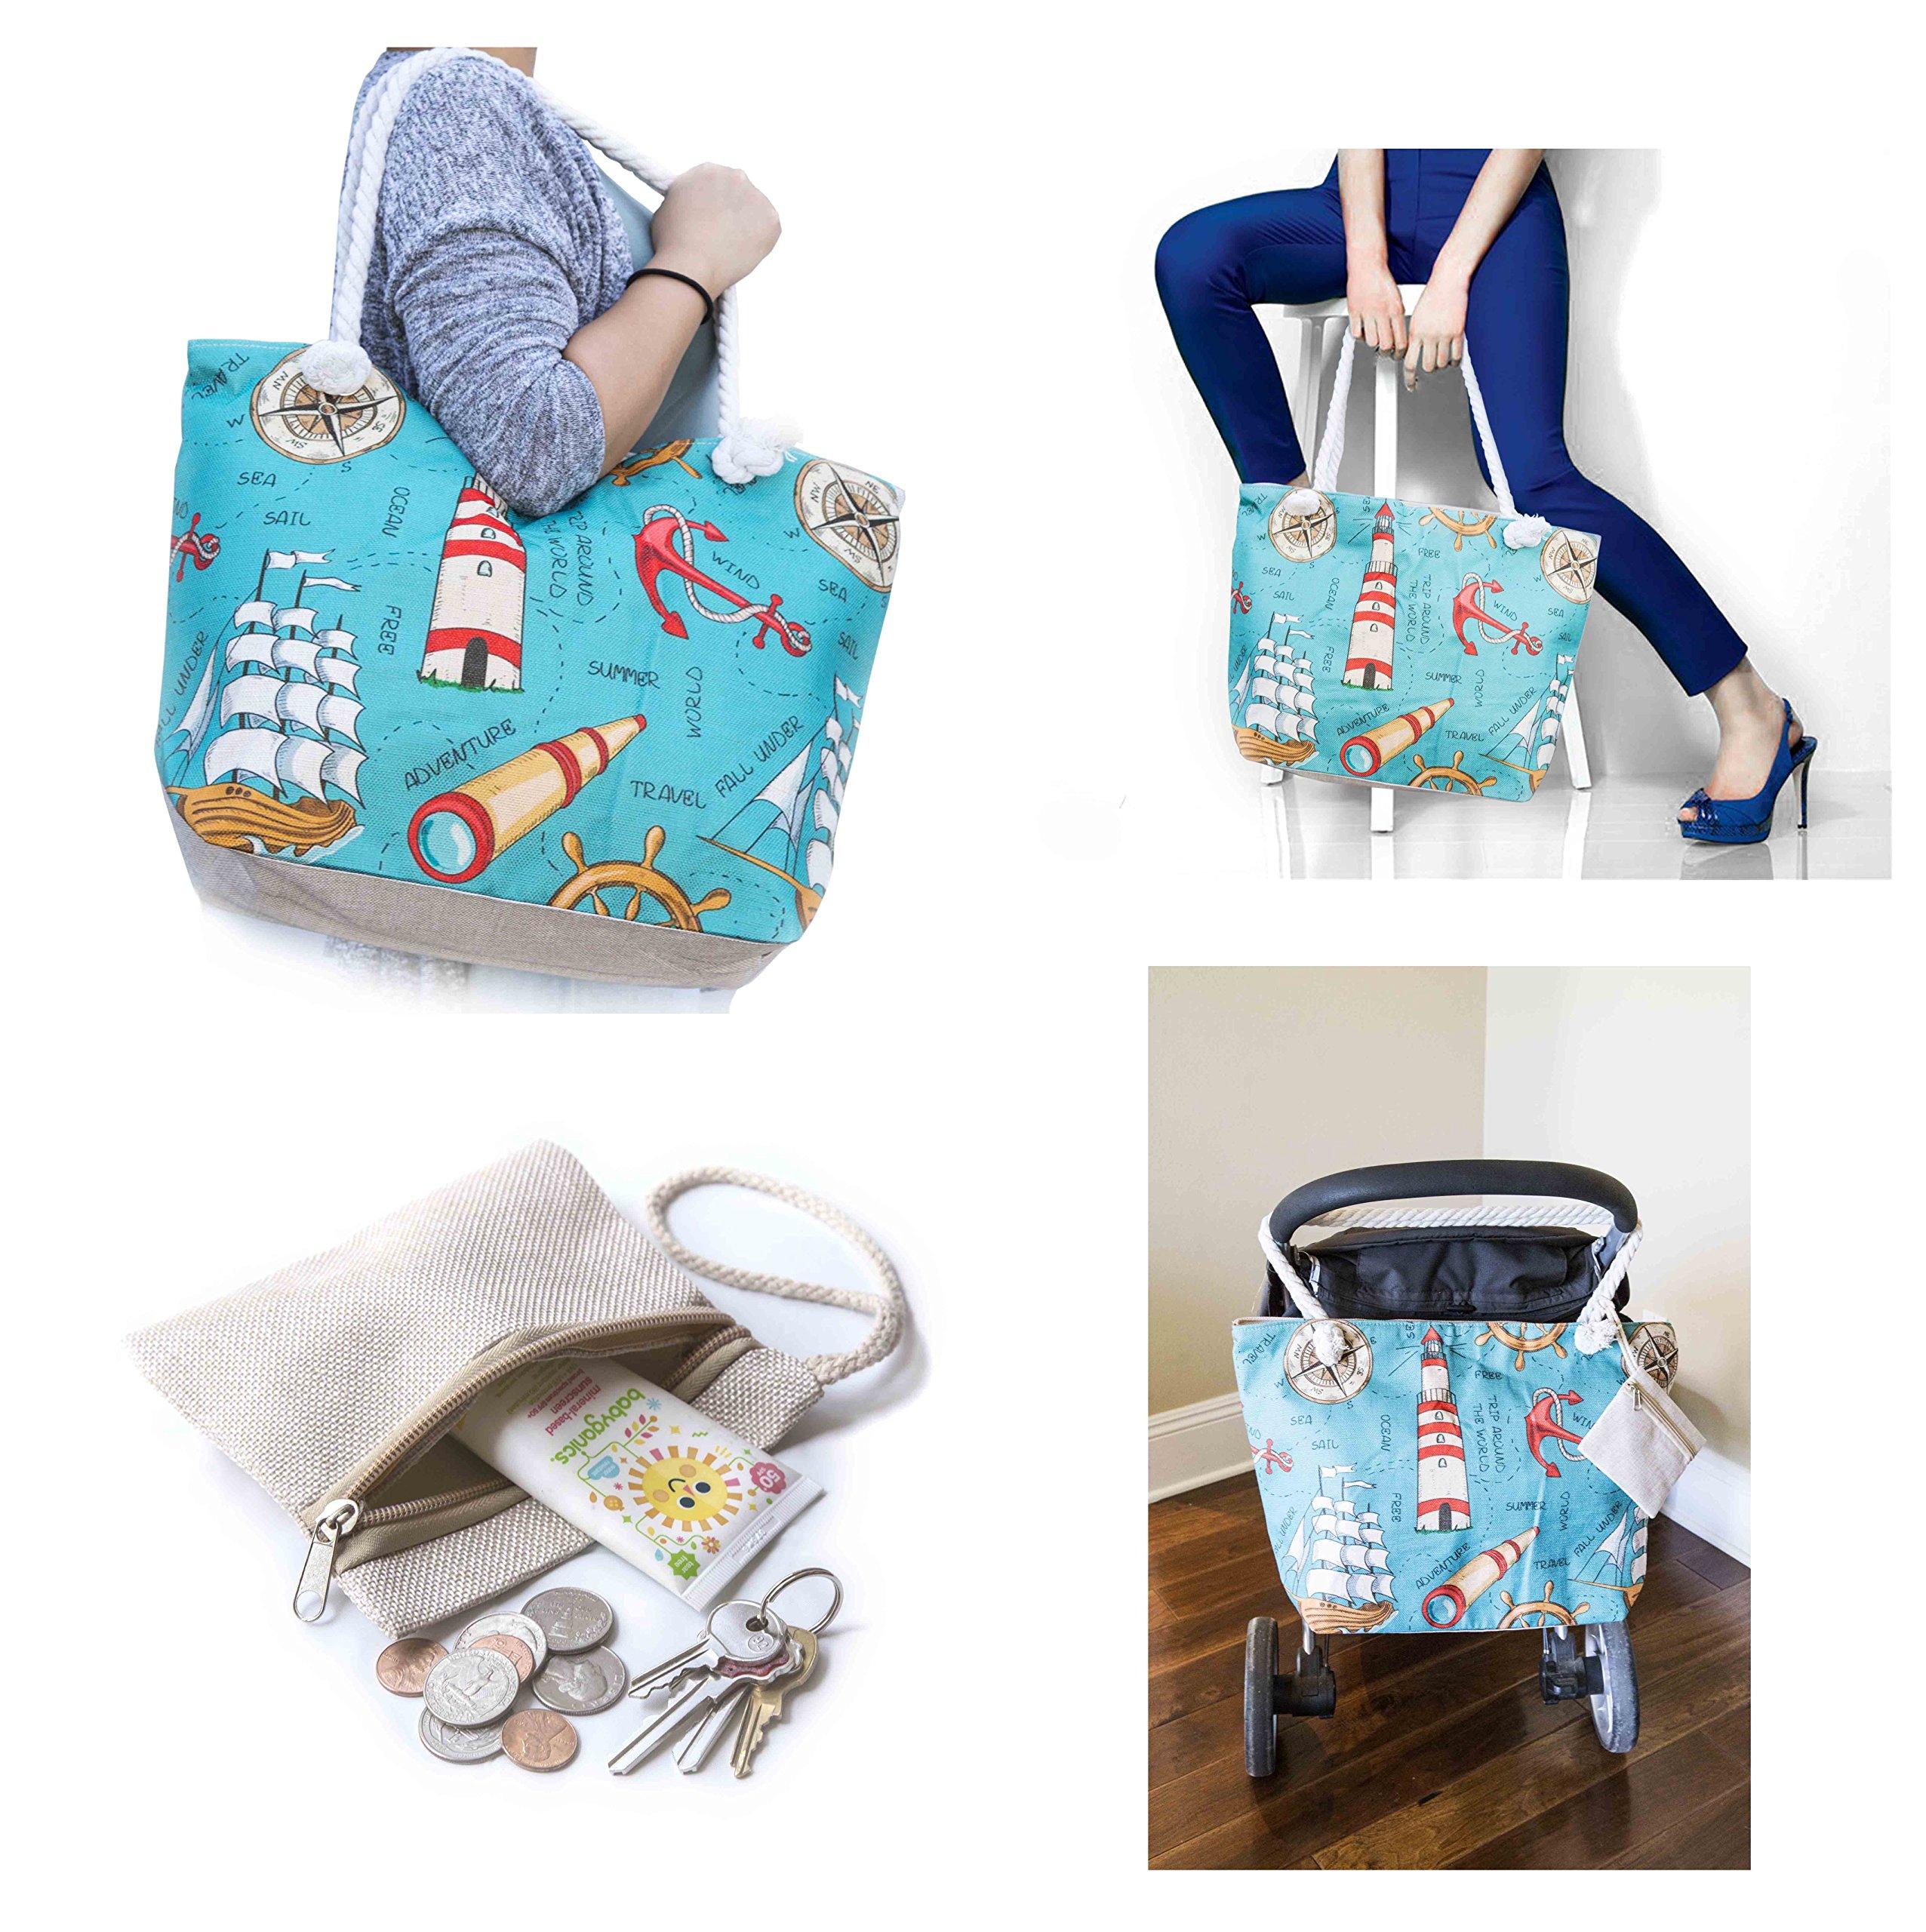 JJMG NEW Summer Beach Bag Stroller Friendly Women's Large Capacity Mom's Tote Beach Shoulder Bag With Rope Handles –Shopping Bag, Diaper Bag, Yoga Bag, Toys, Towels, Swim Suits, etc.